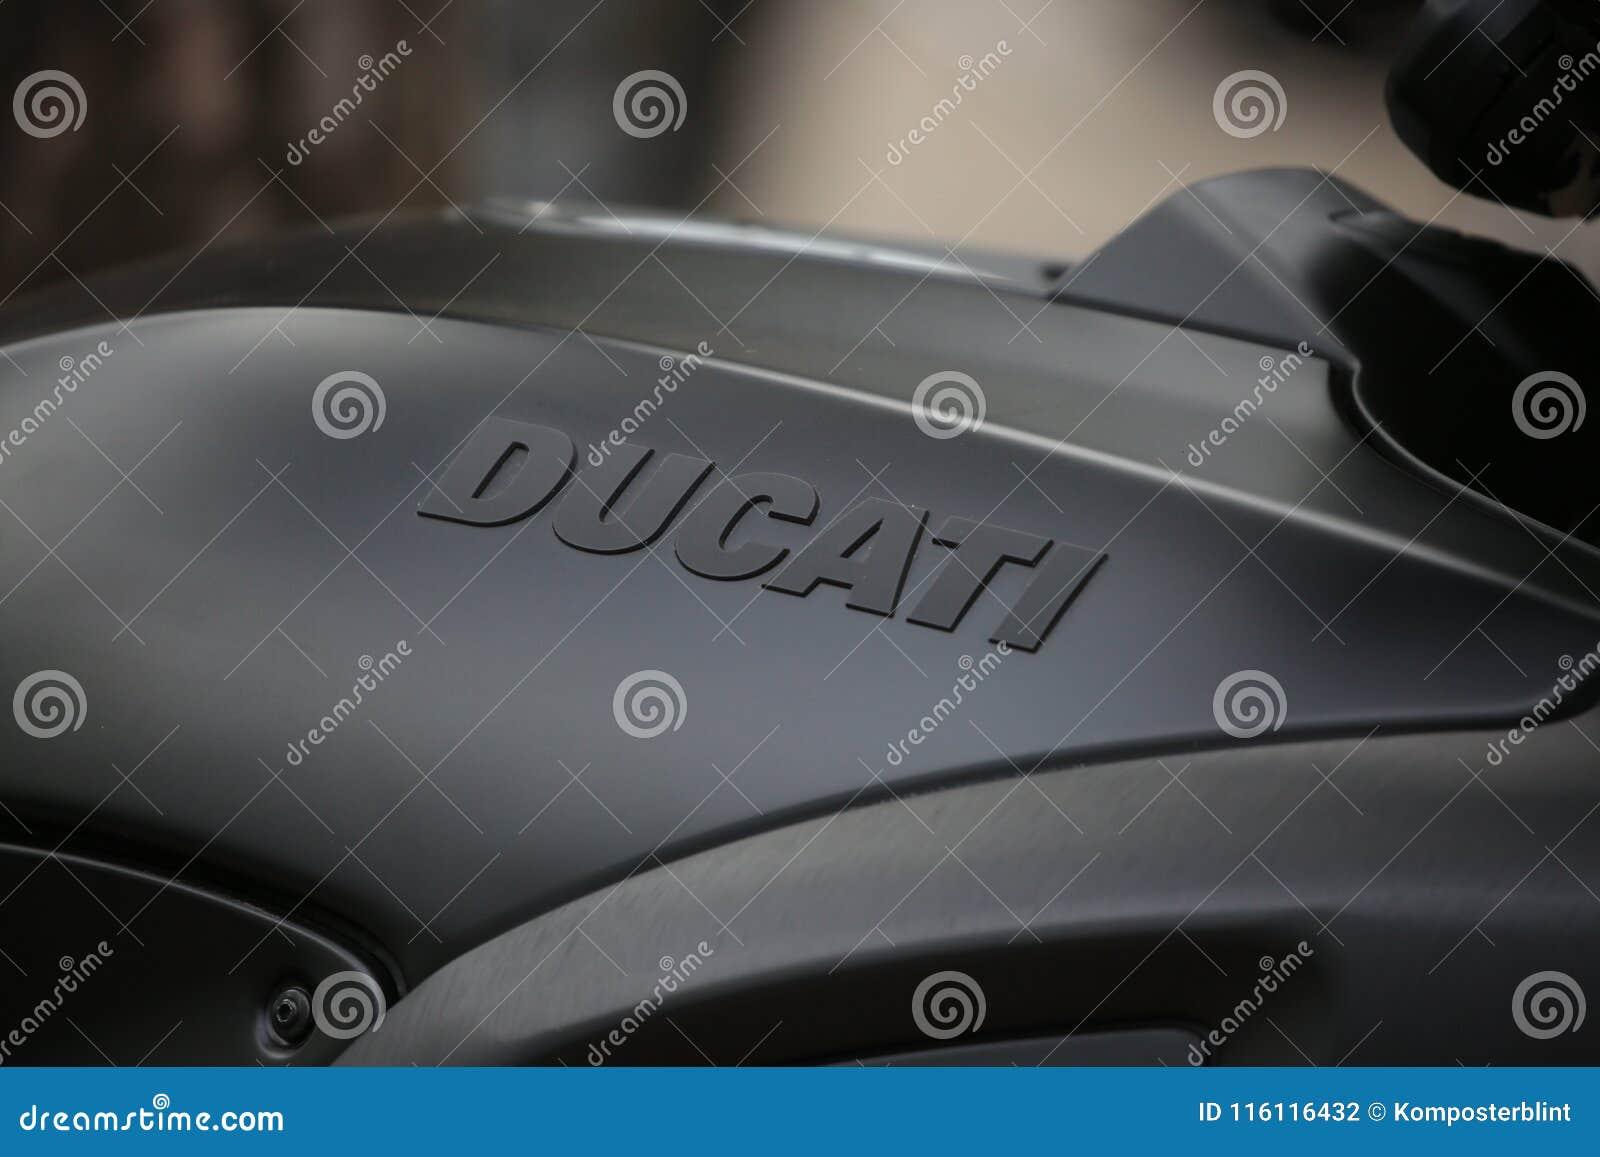 Motorcycle Ducati Diavel Matt Black  Brand Name On Petrol Tank Close